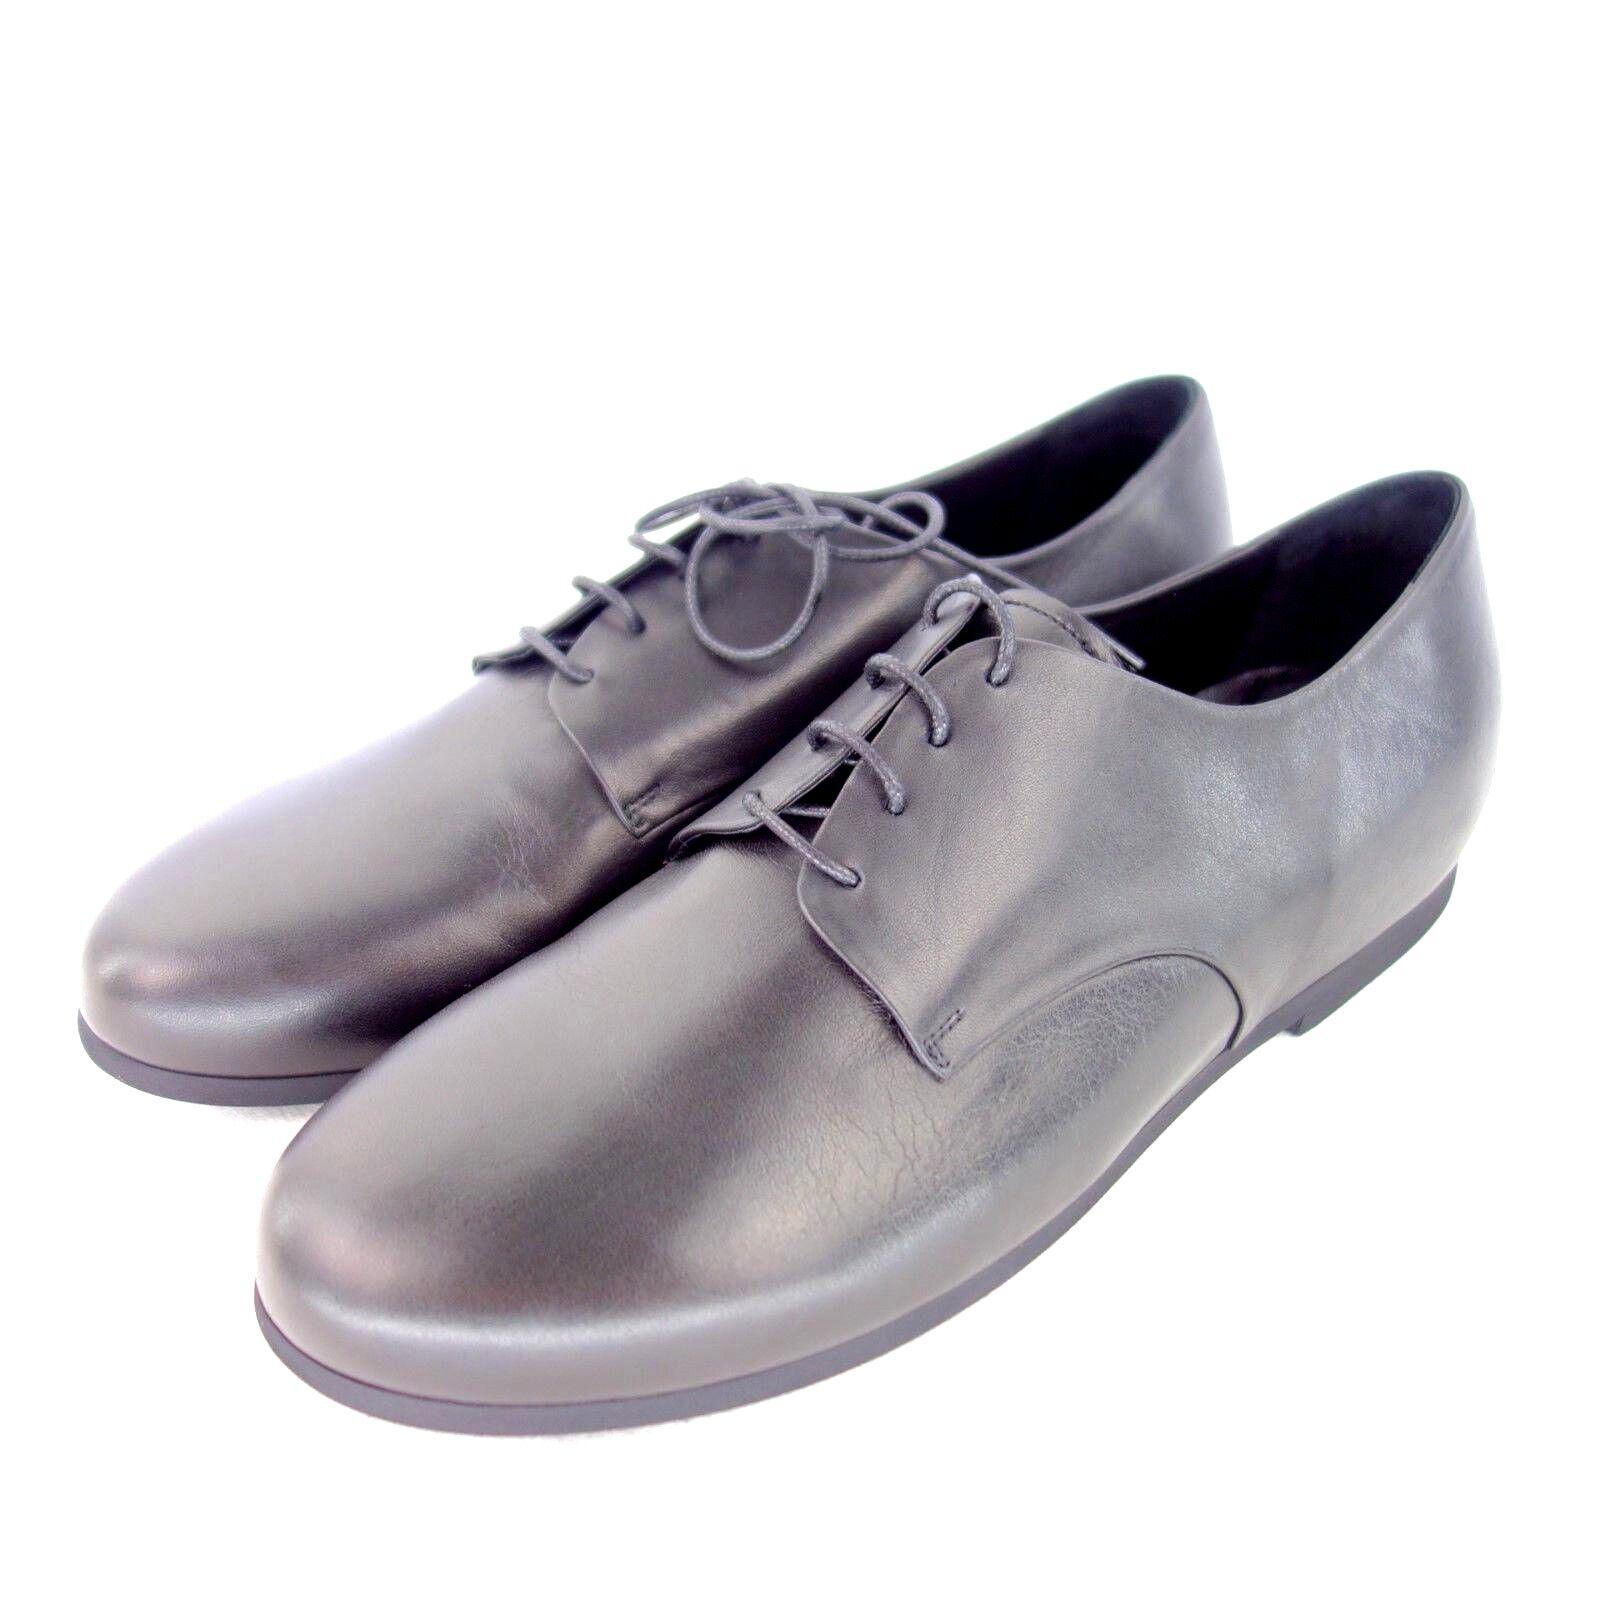 Volere Maria Fiori women shoes Basse Loafer black pelle Tinta Unita Np 219 Nuovo